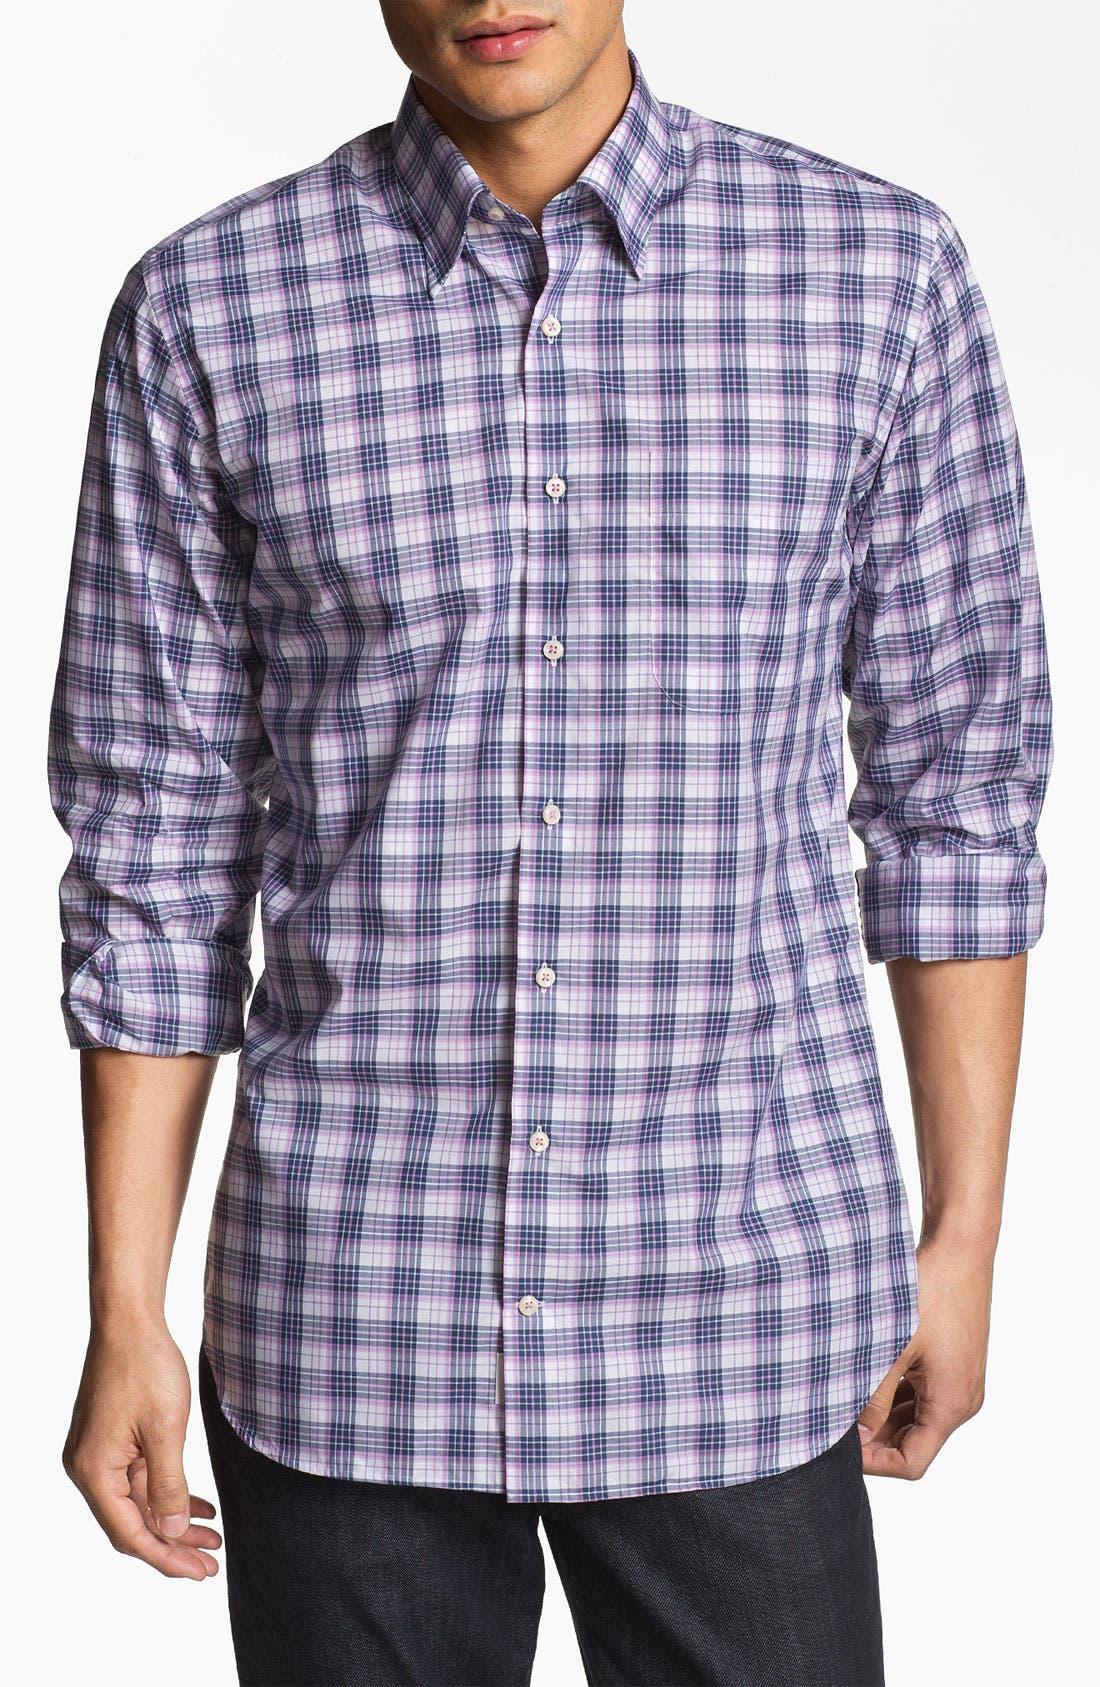 Main Image - Peter Millar 'Portofino' Regular Fit Sport Shirt